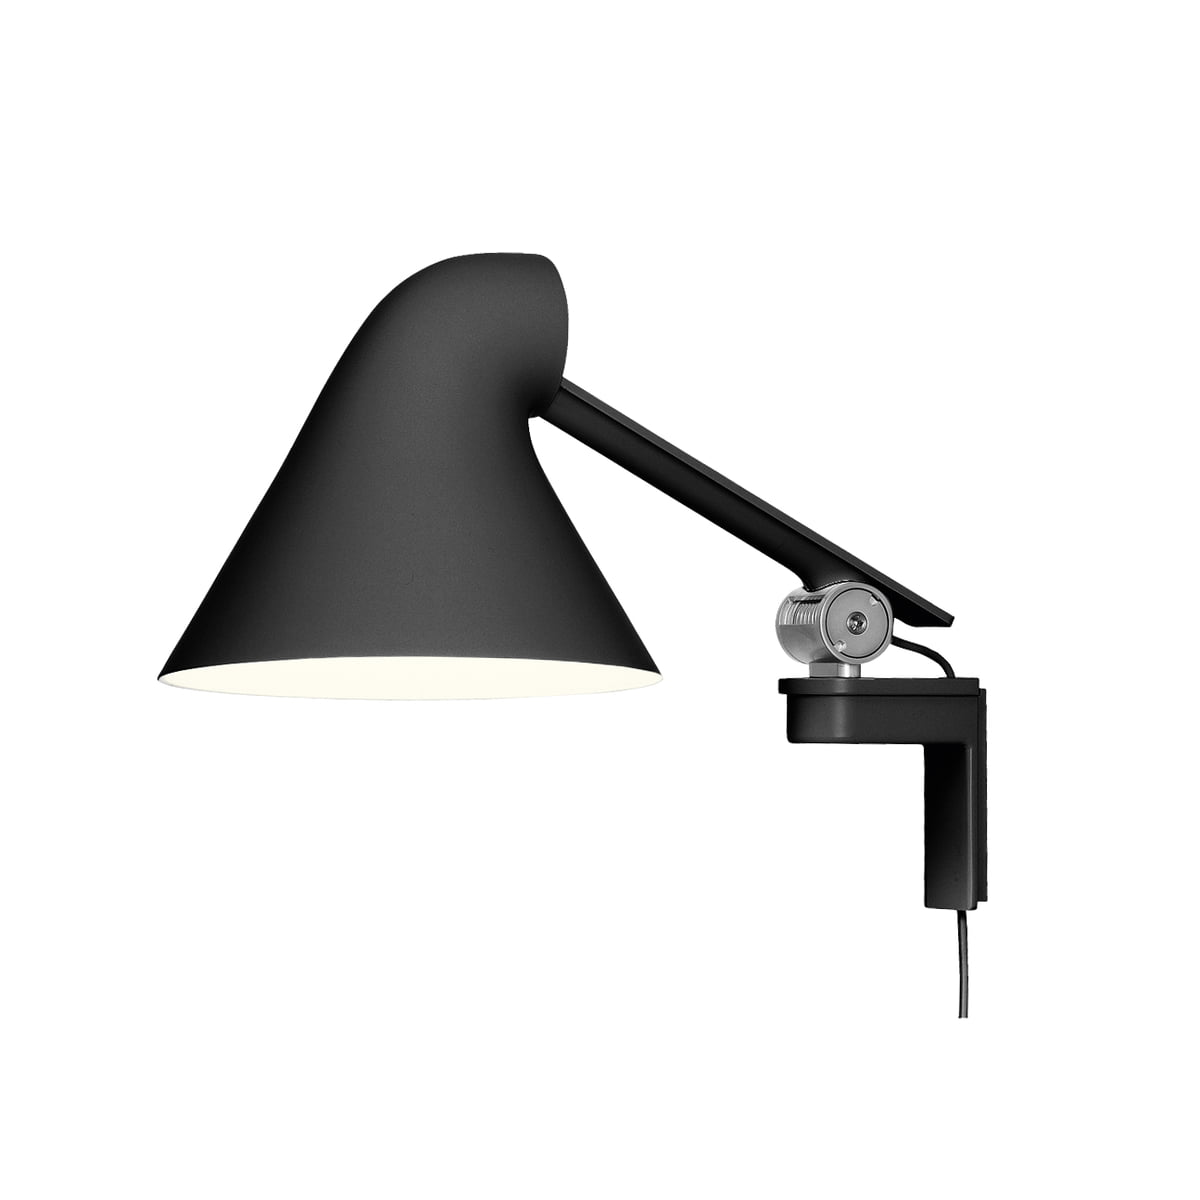 e4ddd53499c NJP væglampe fra Louis Poulsen i interiørshoppen